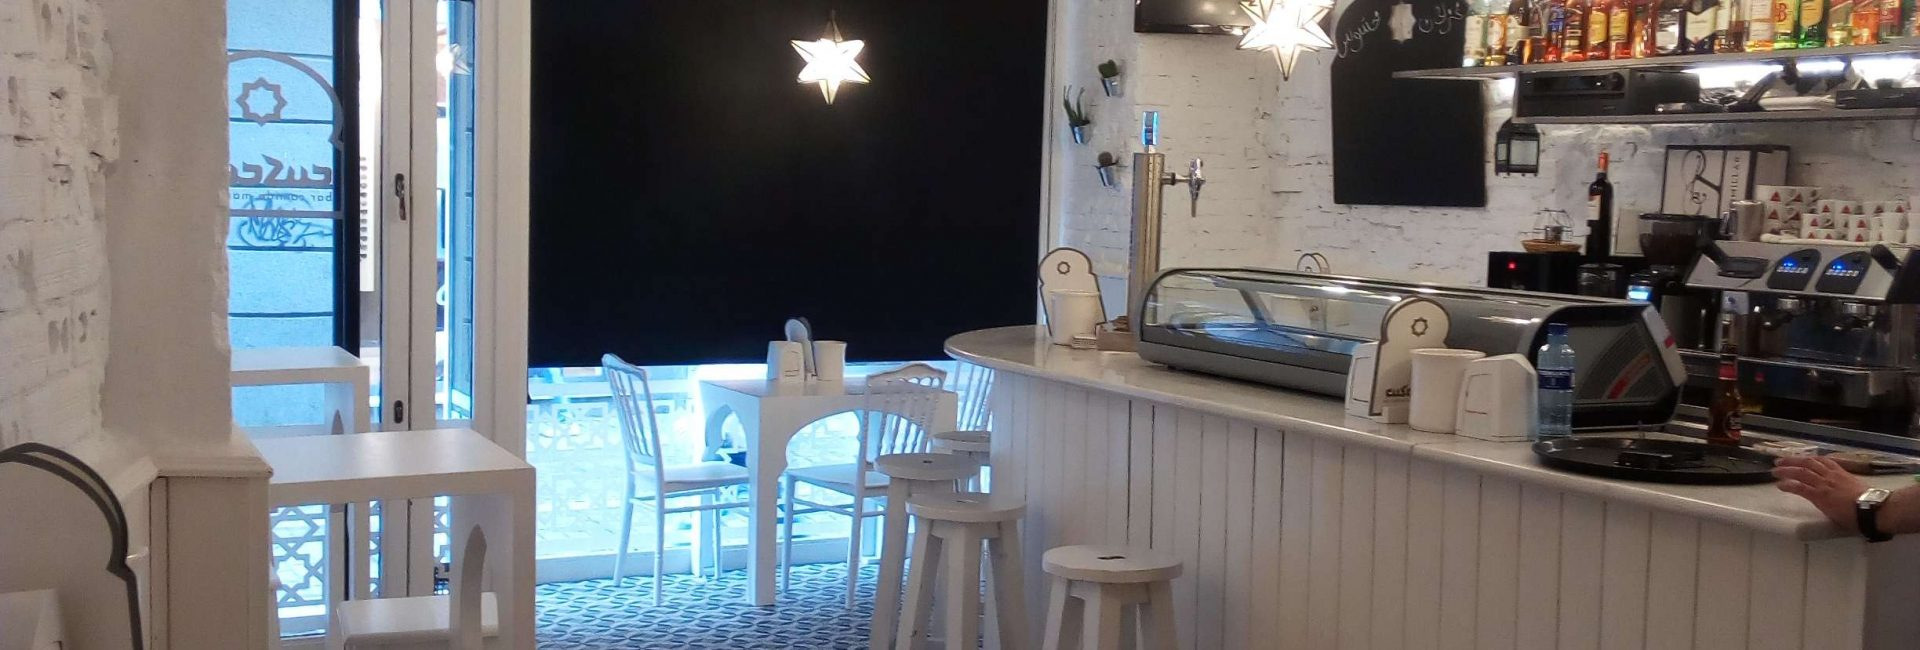 Restaurante Cuscús